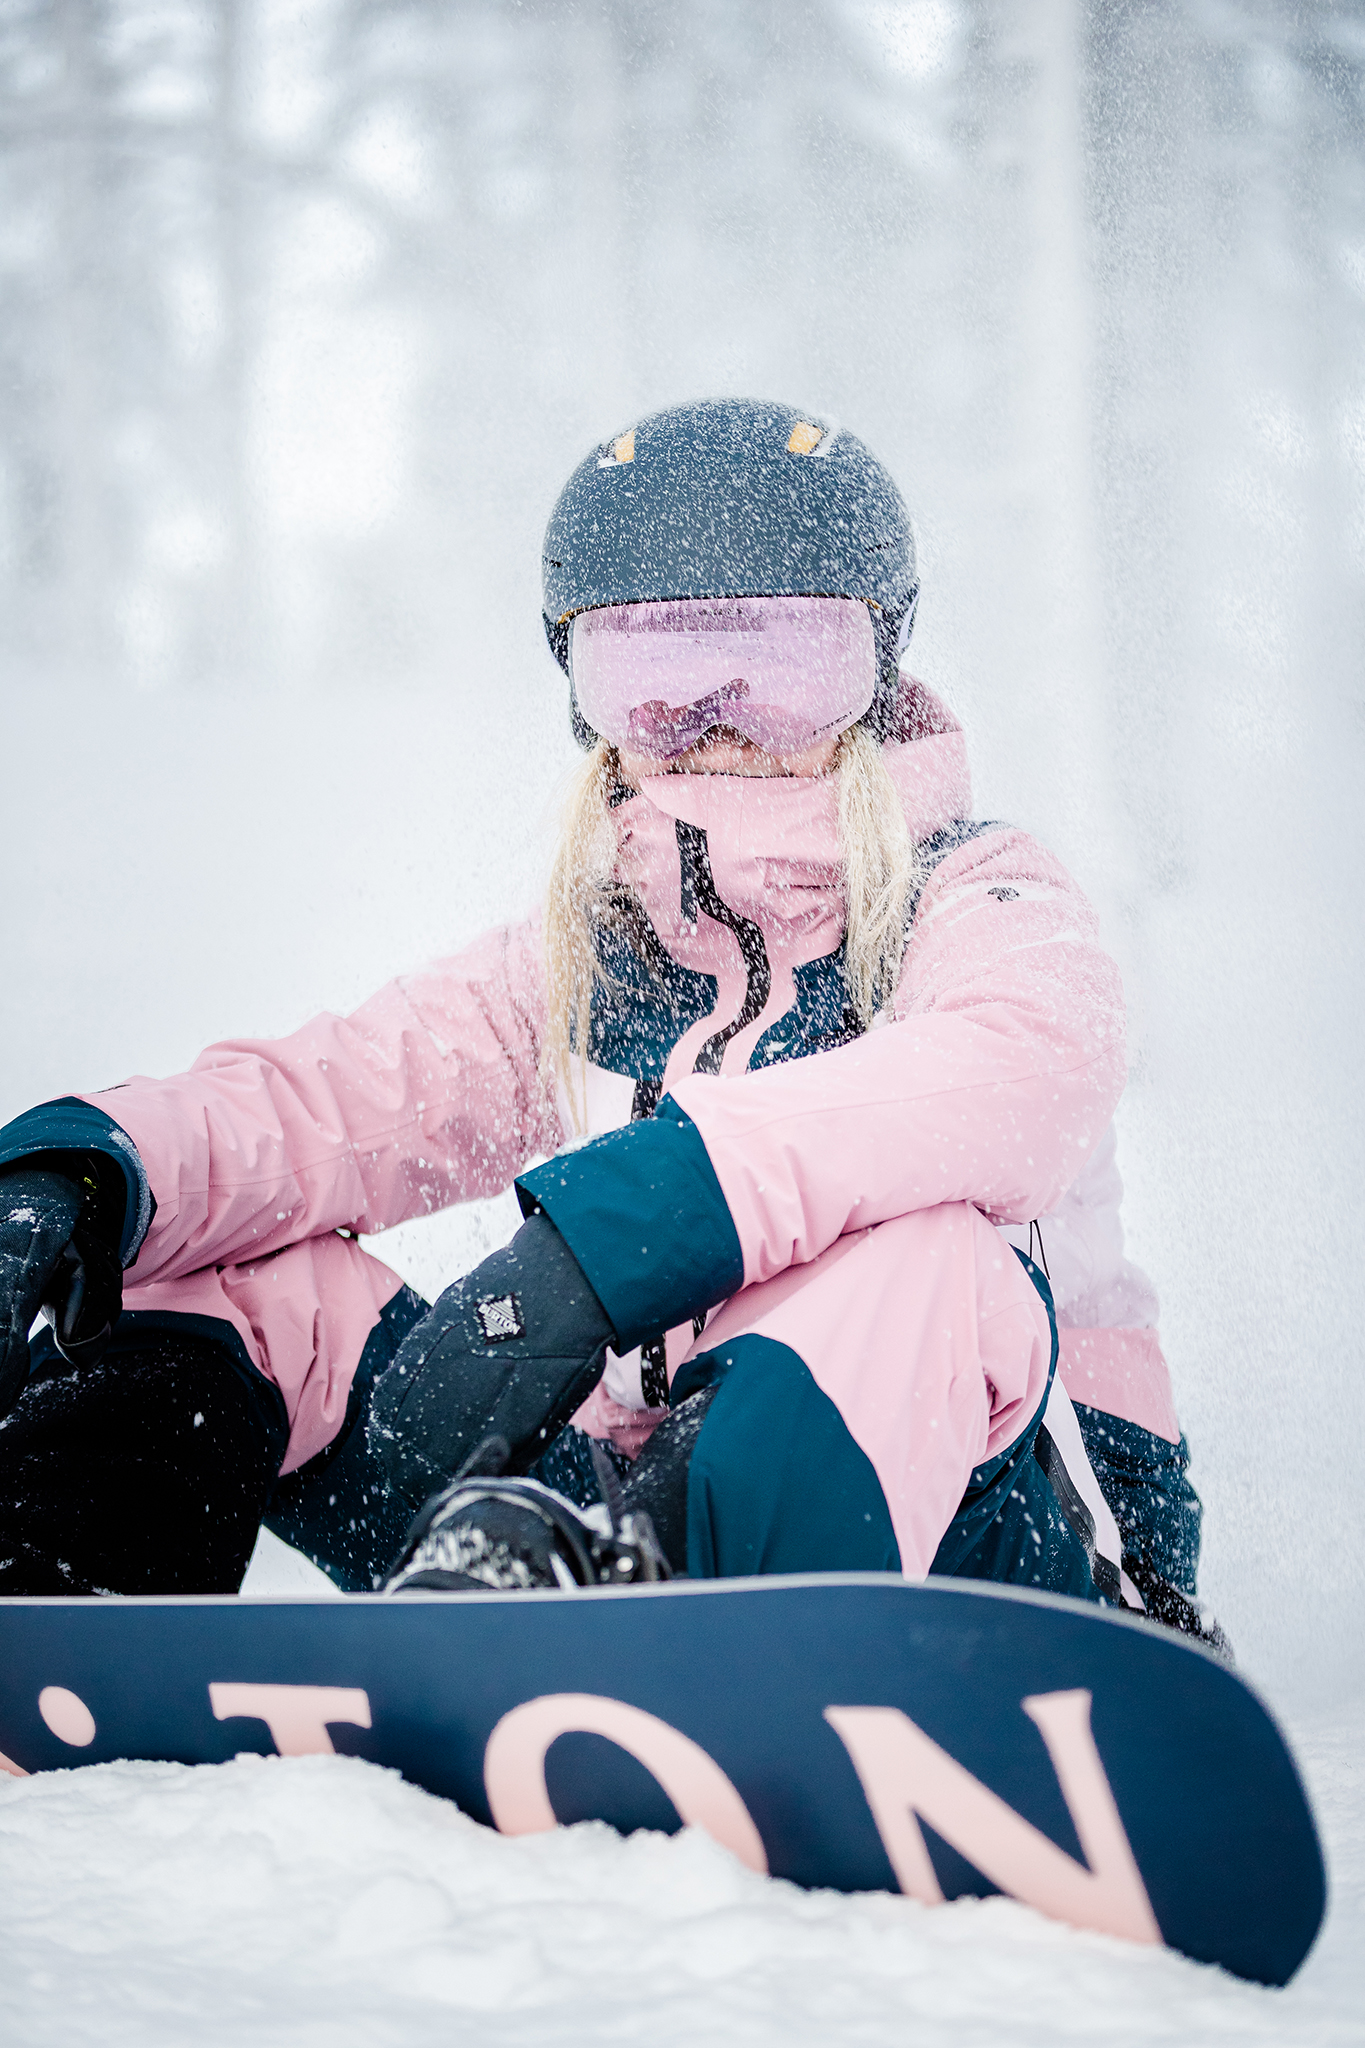 Levi_Ski_Resort_2020_Winter_laskemaan